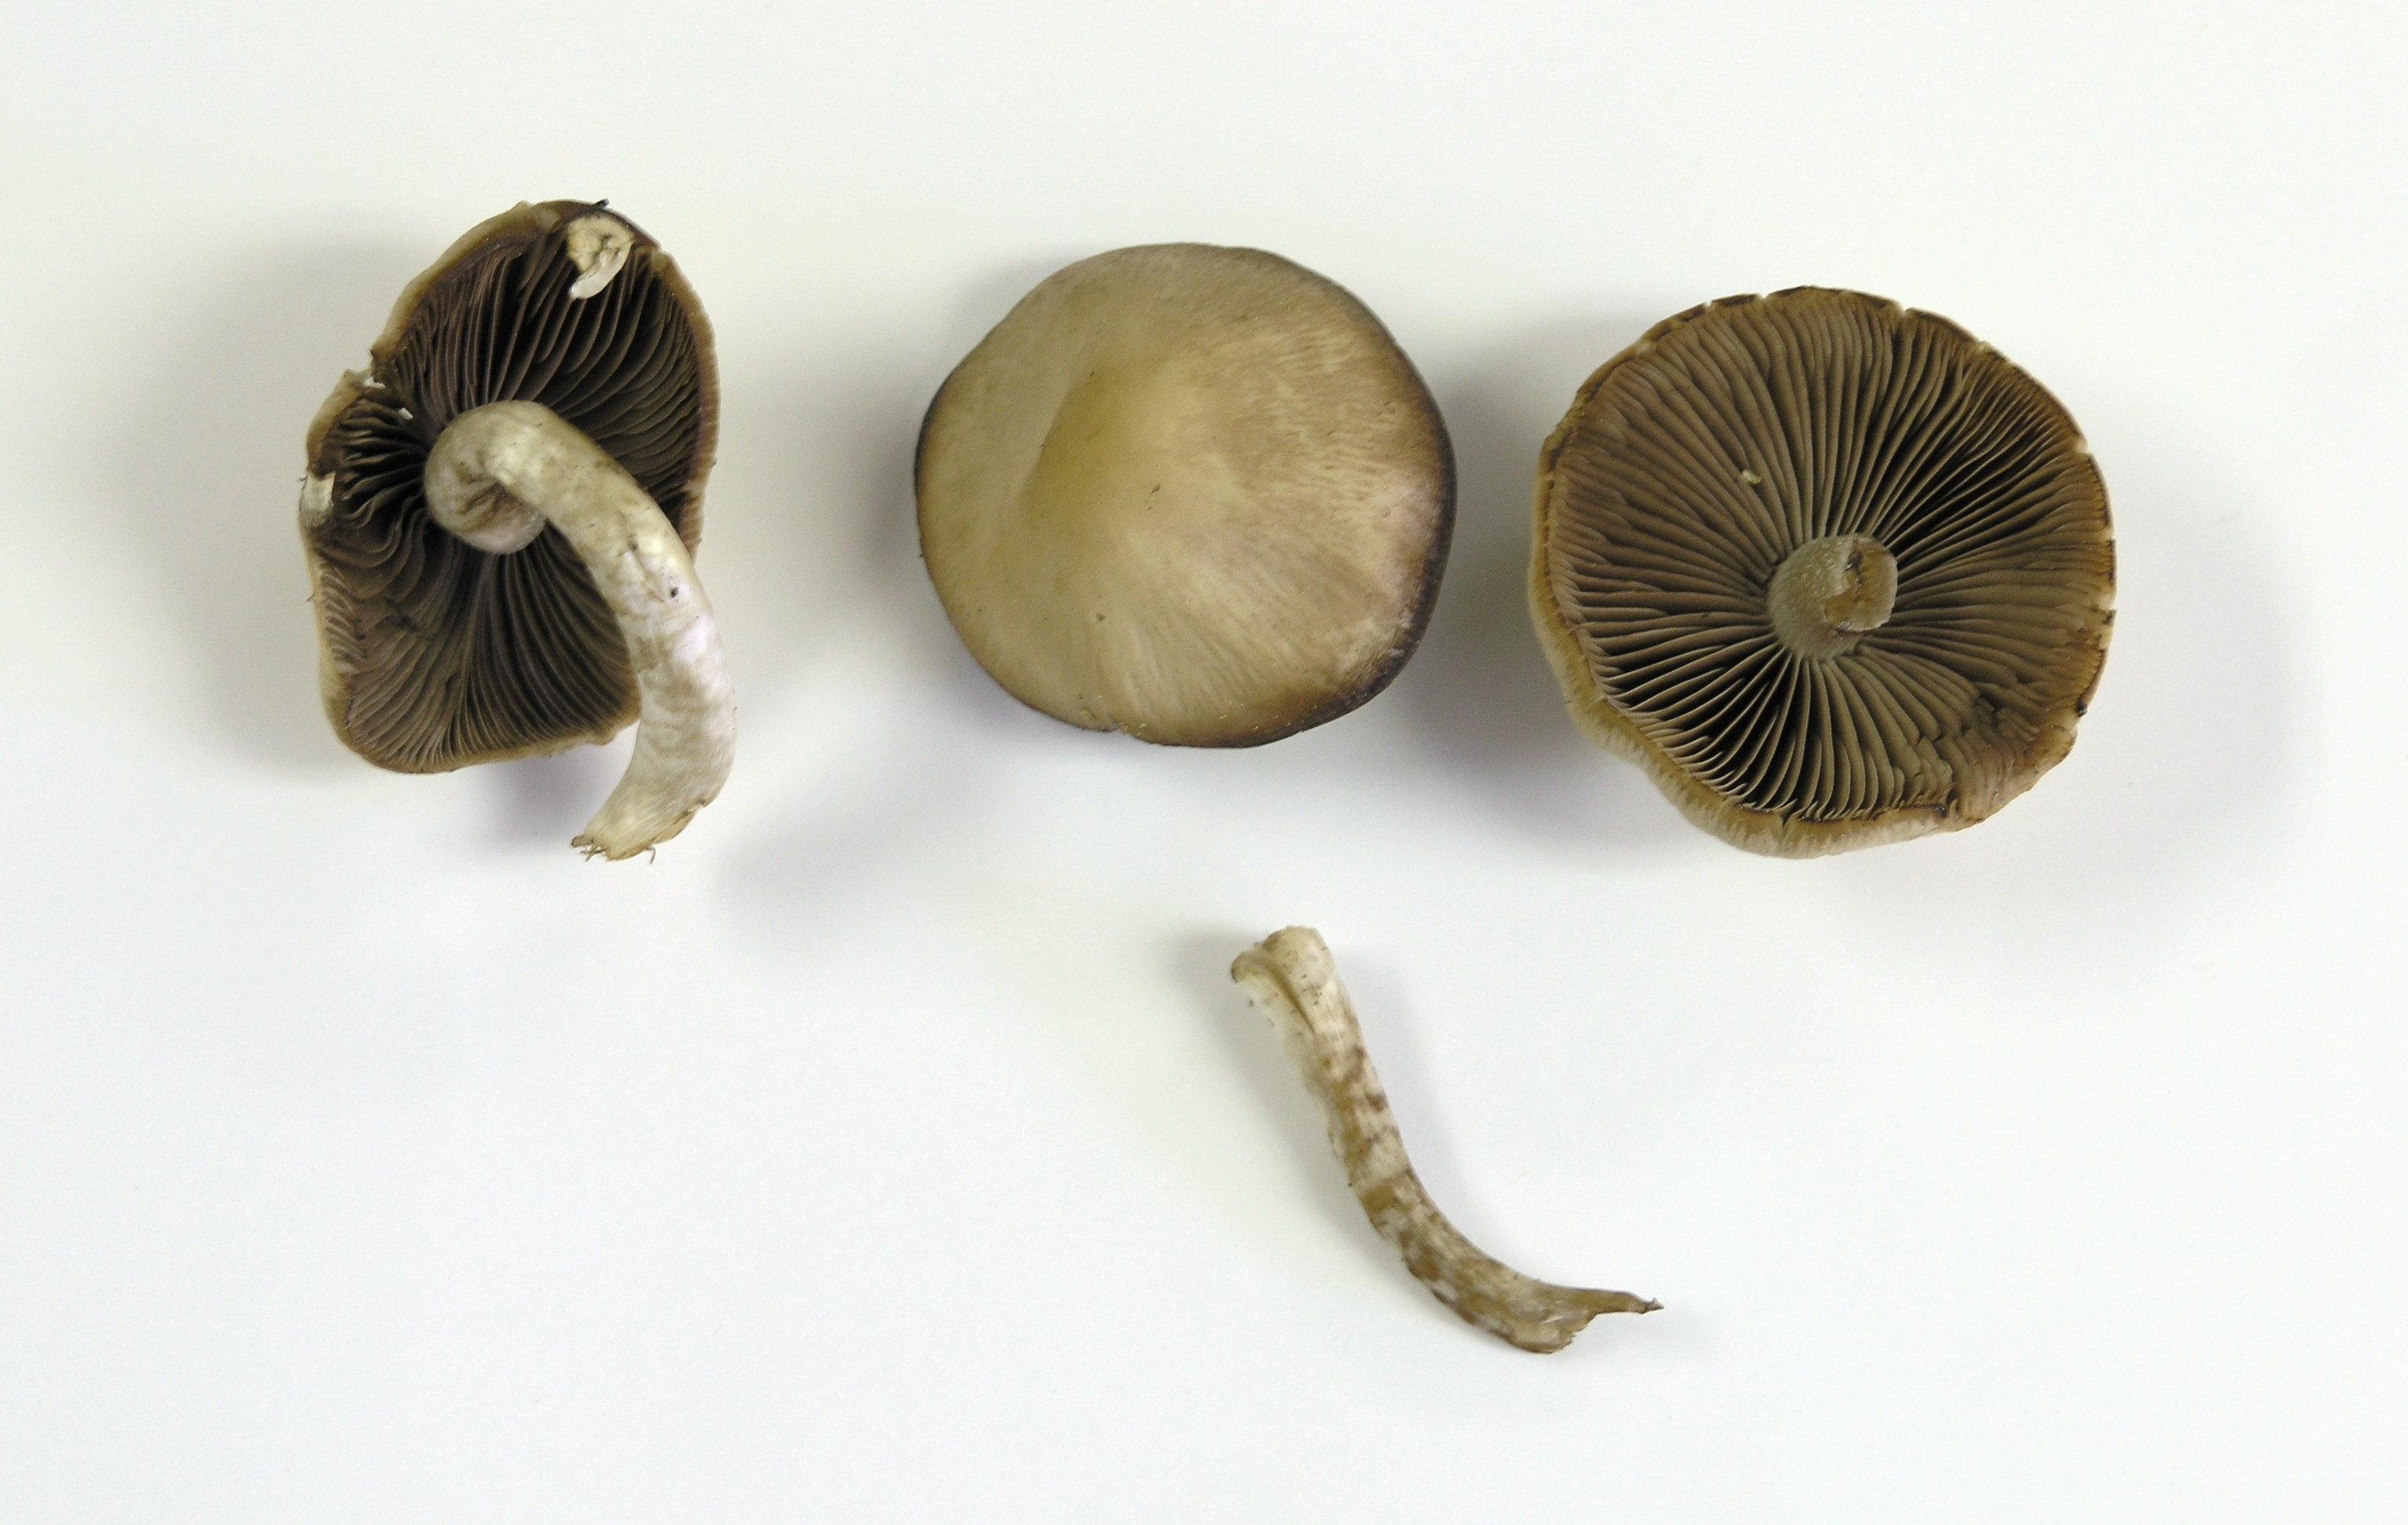 Psathyrella ellenae image